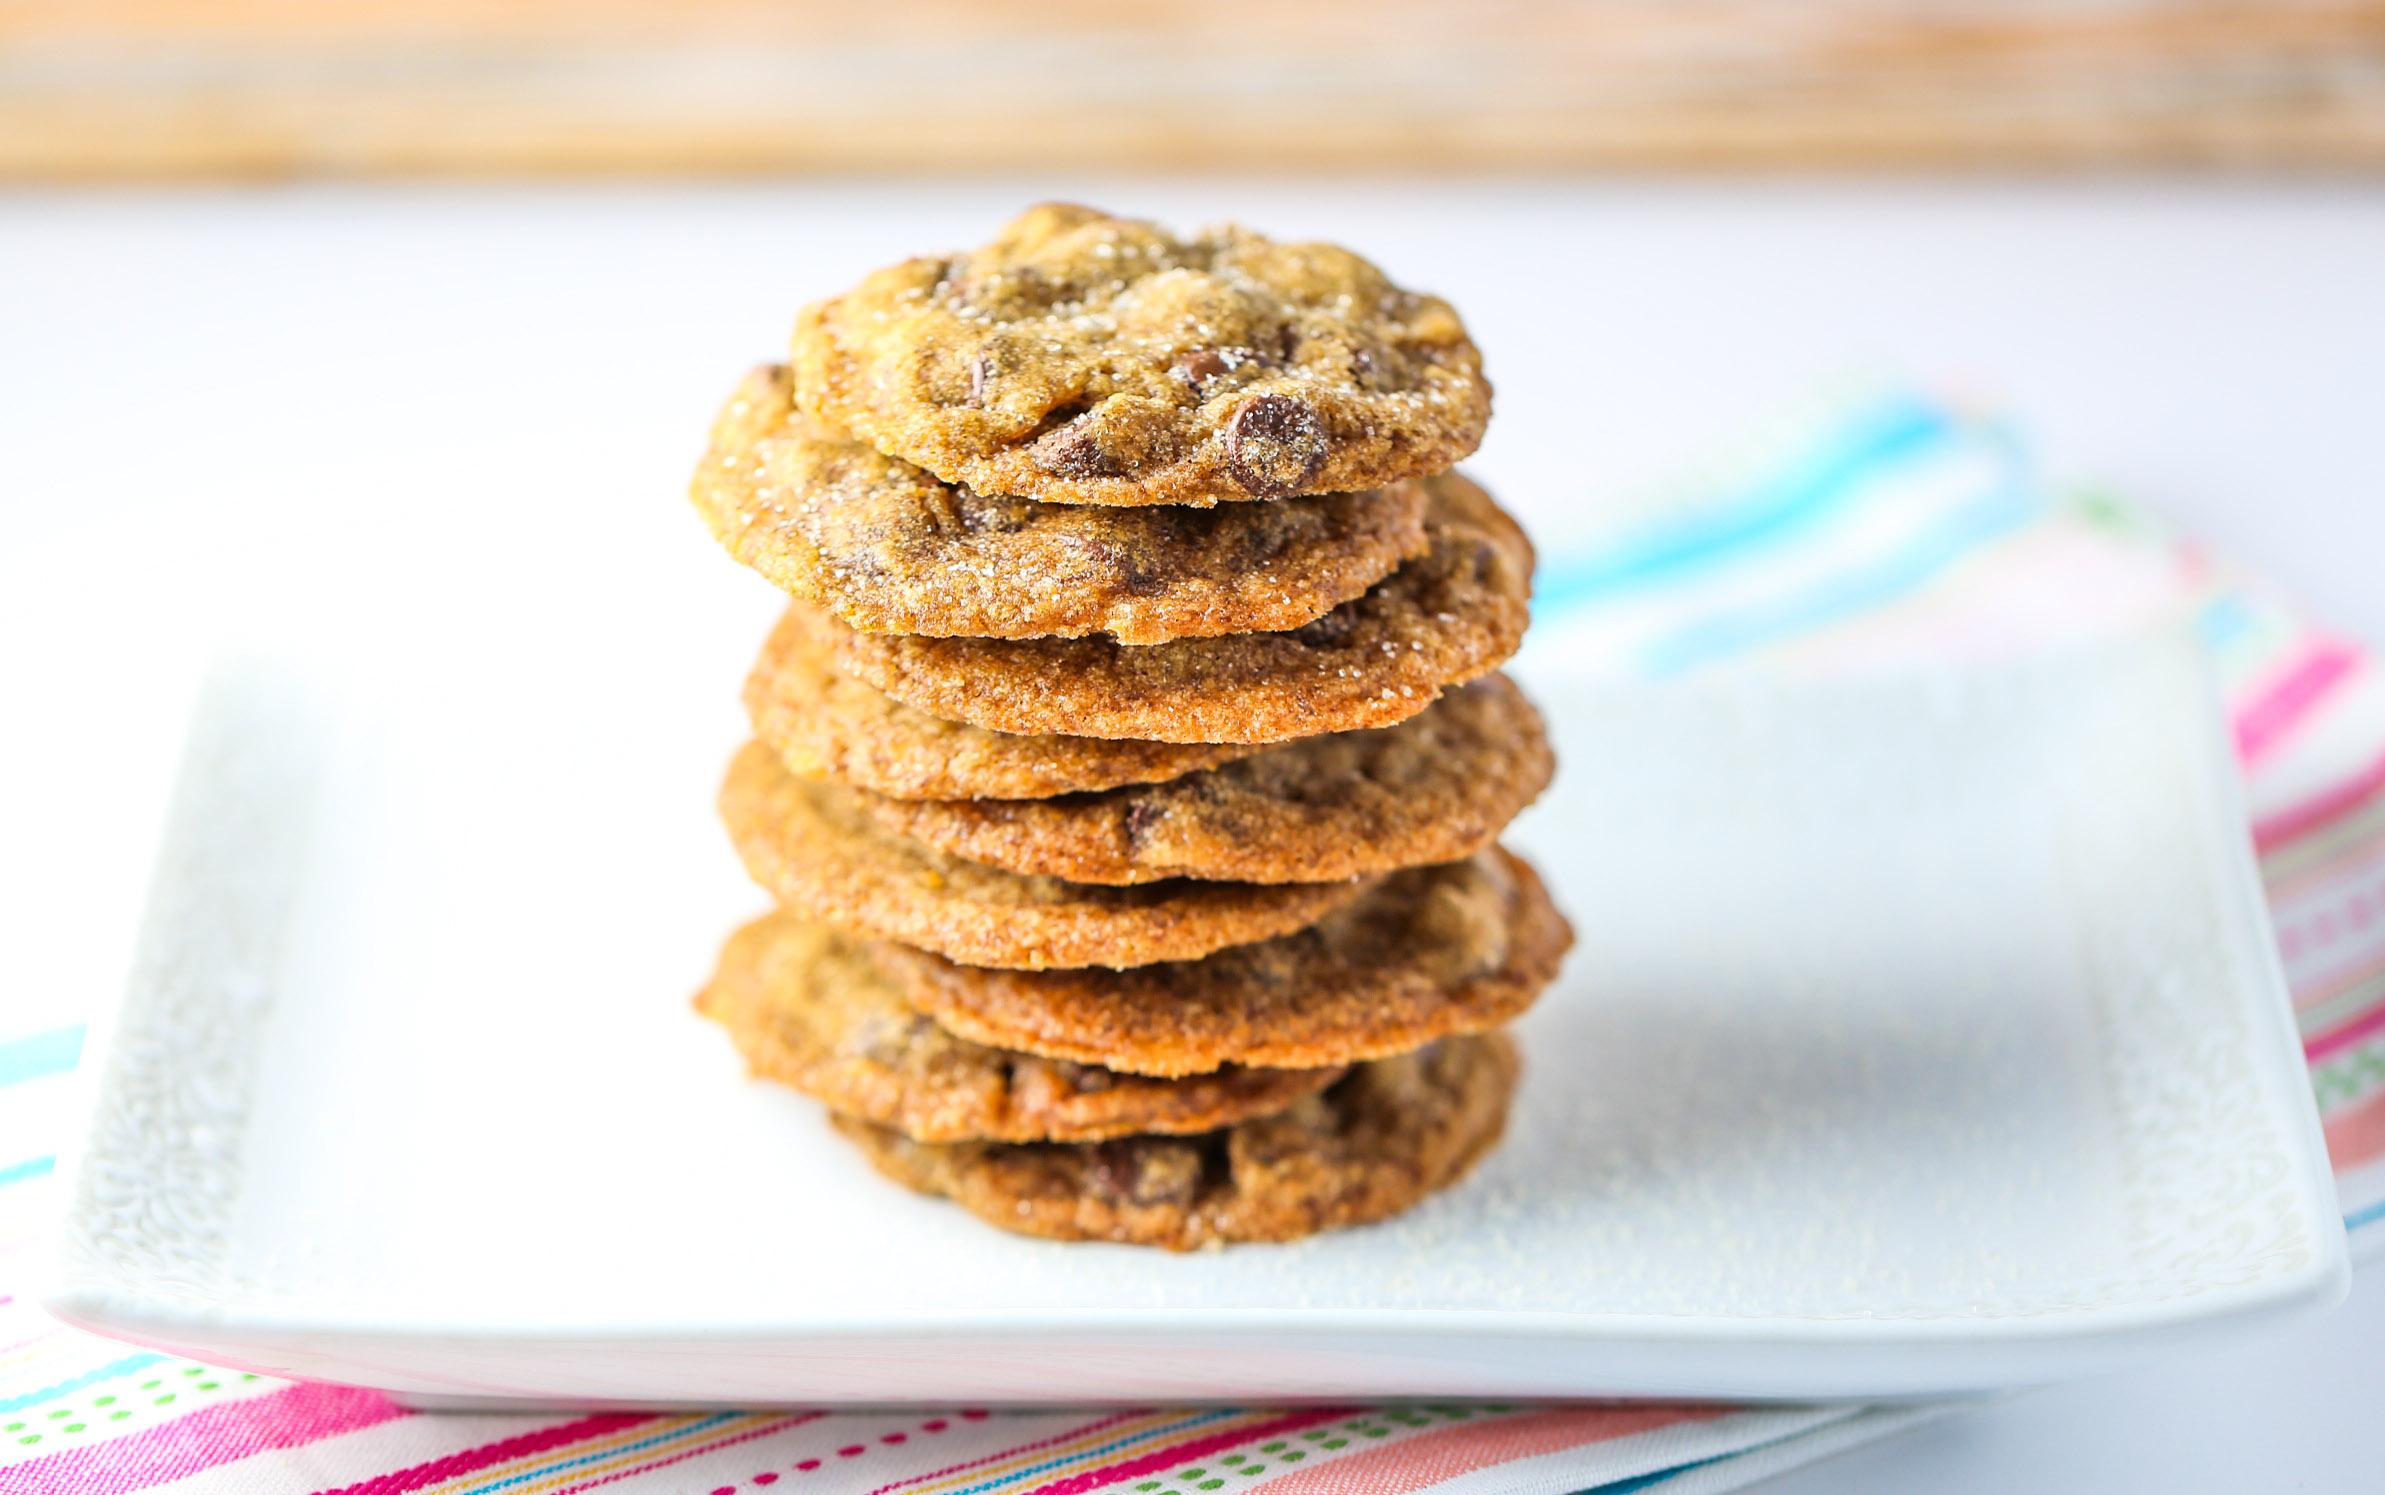 Cinnamon Espresso Chocolate Chip Cookies